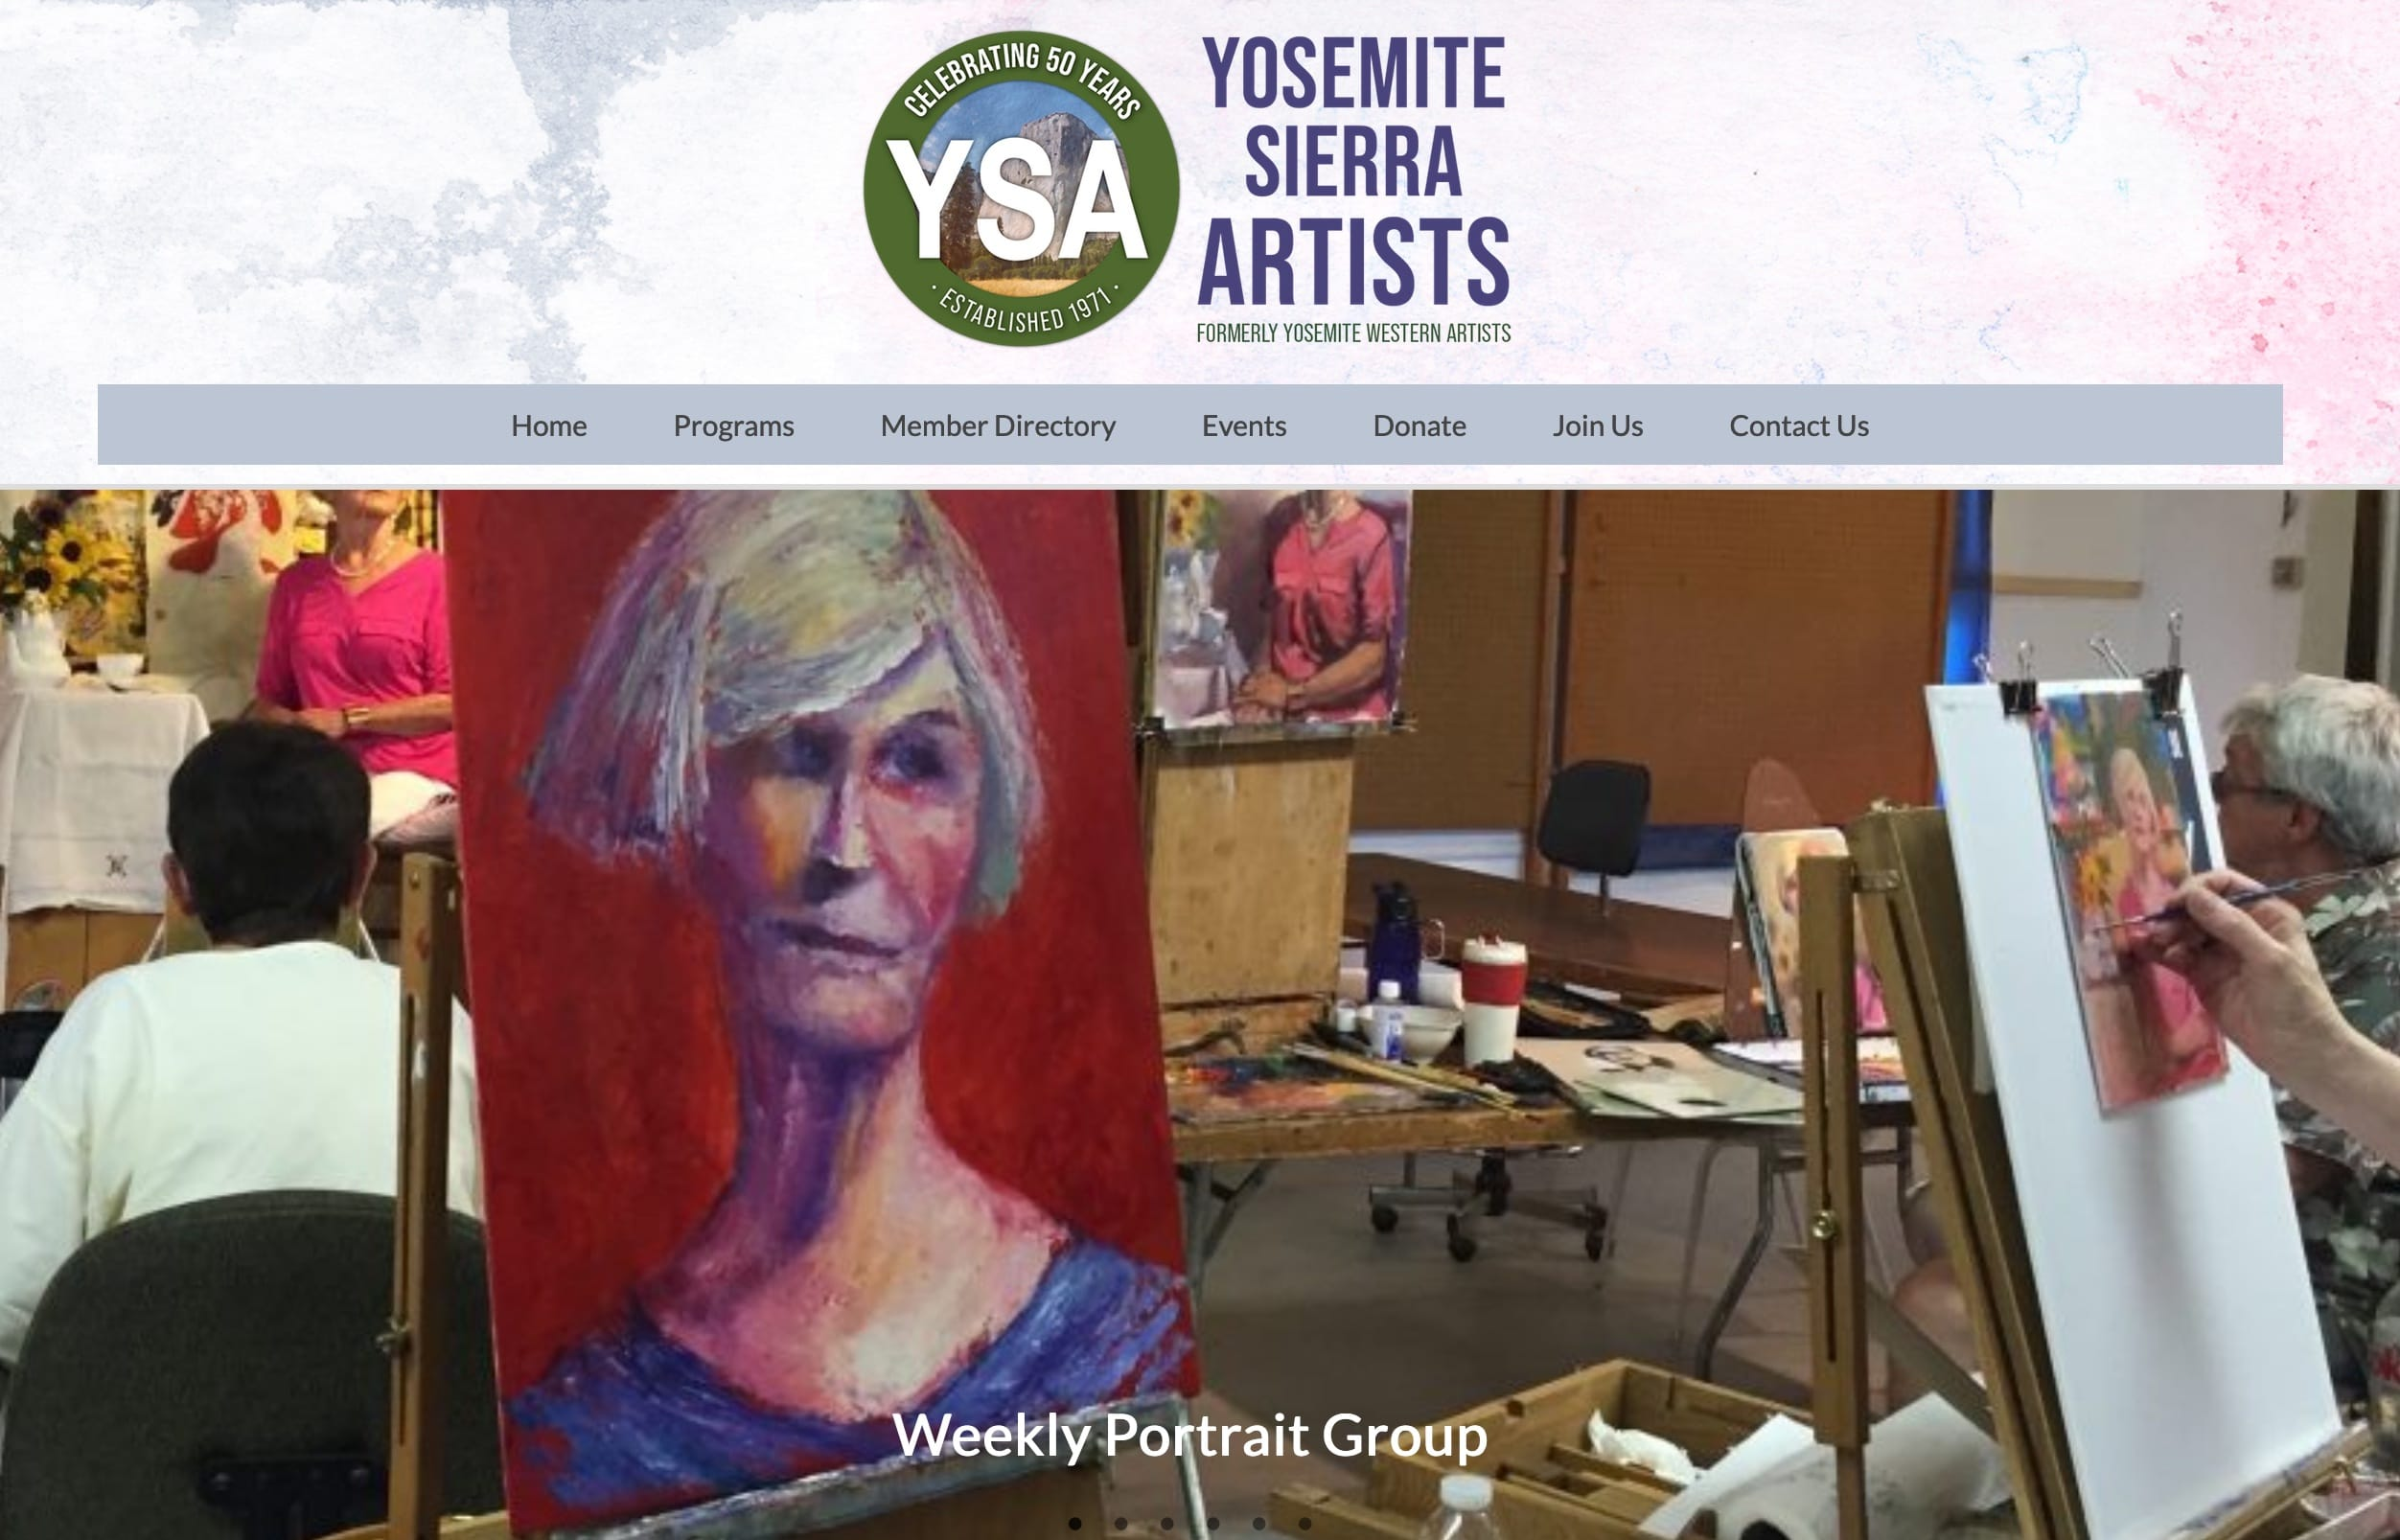 Yosemite Sierra Artists